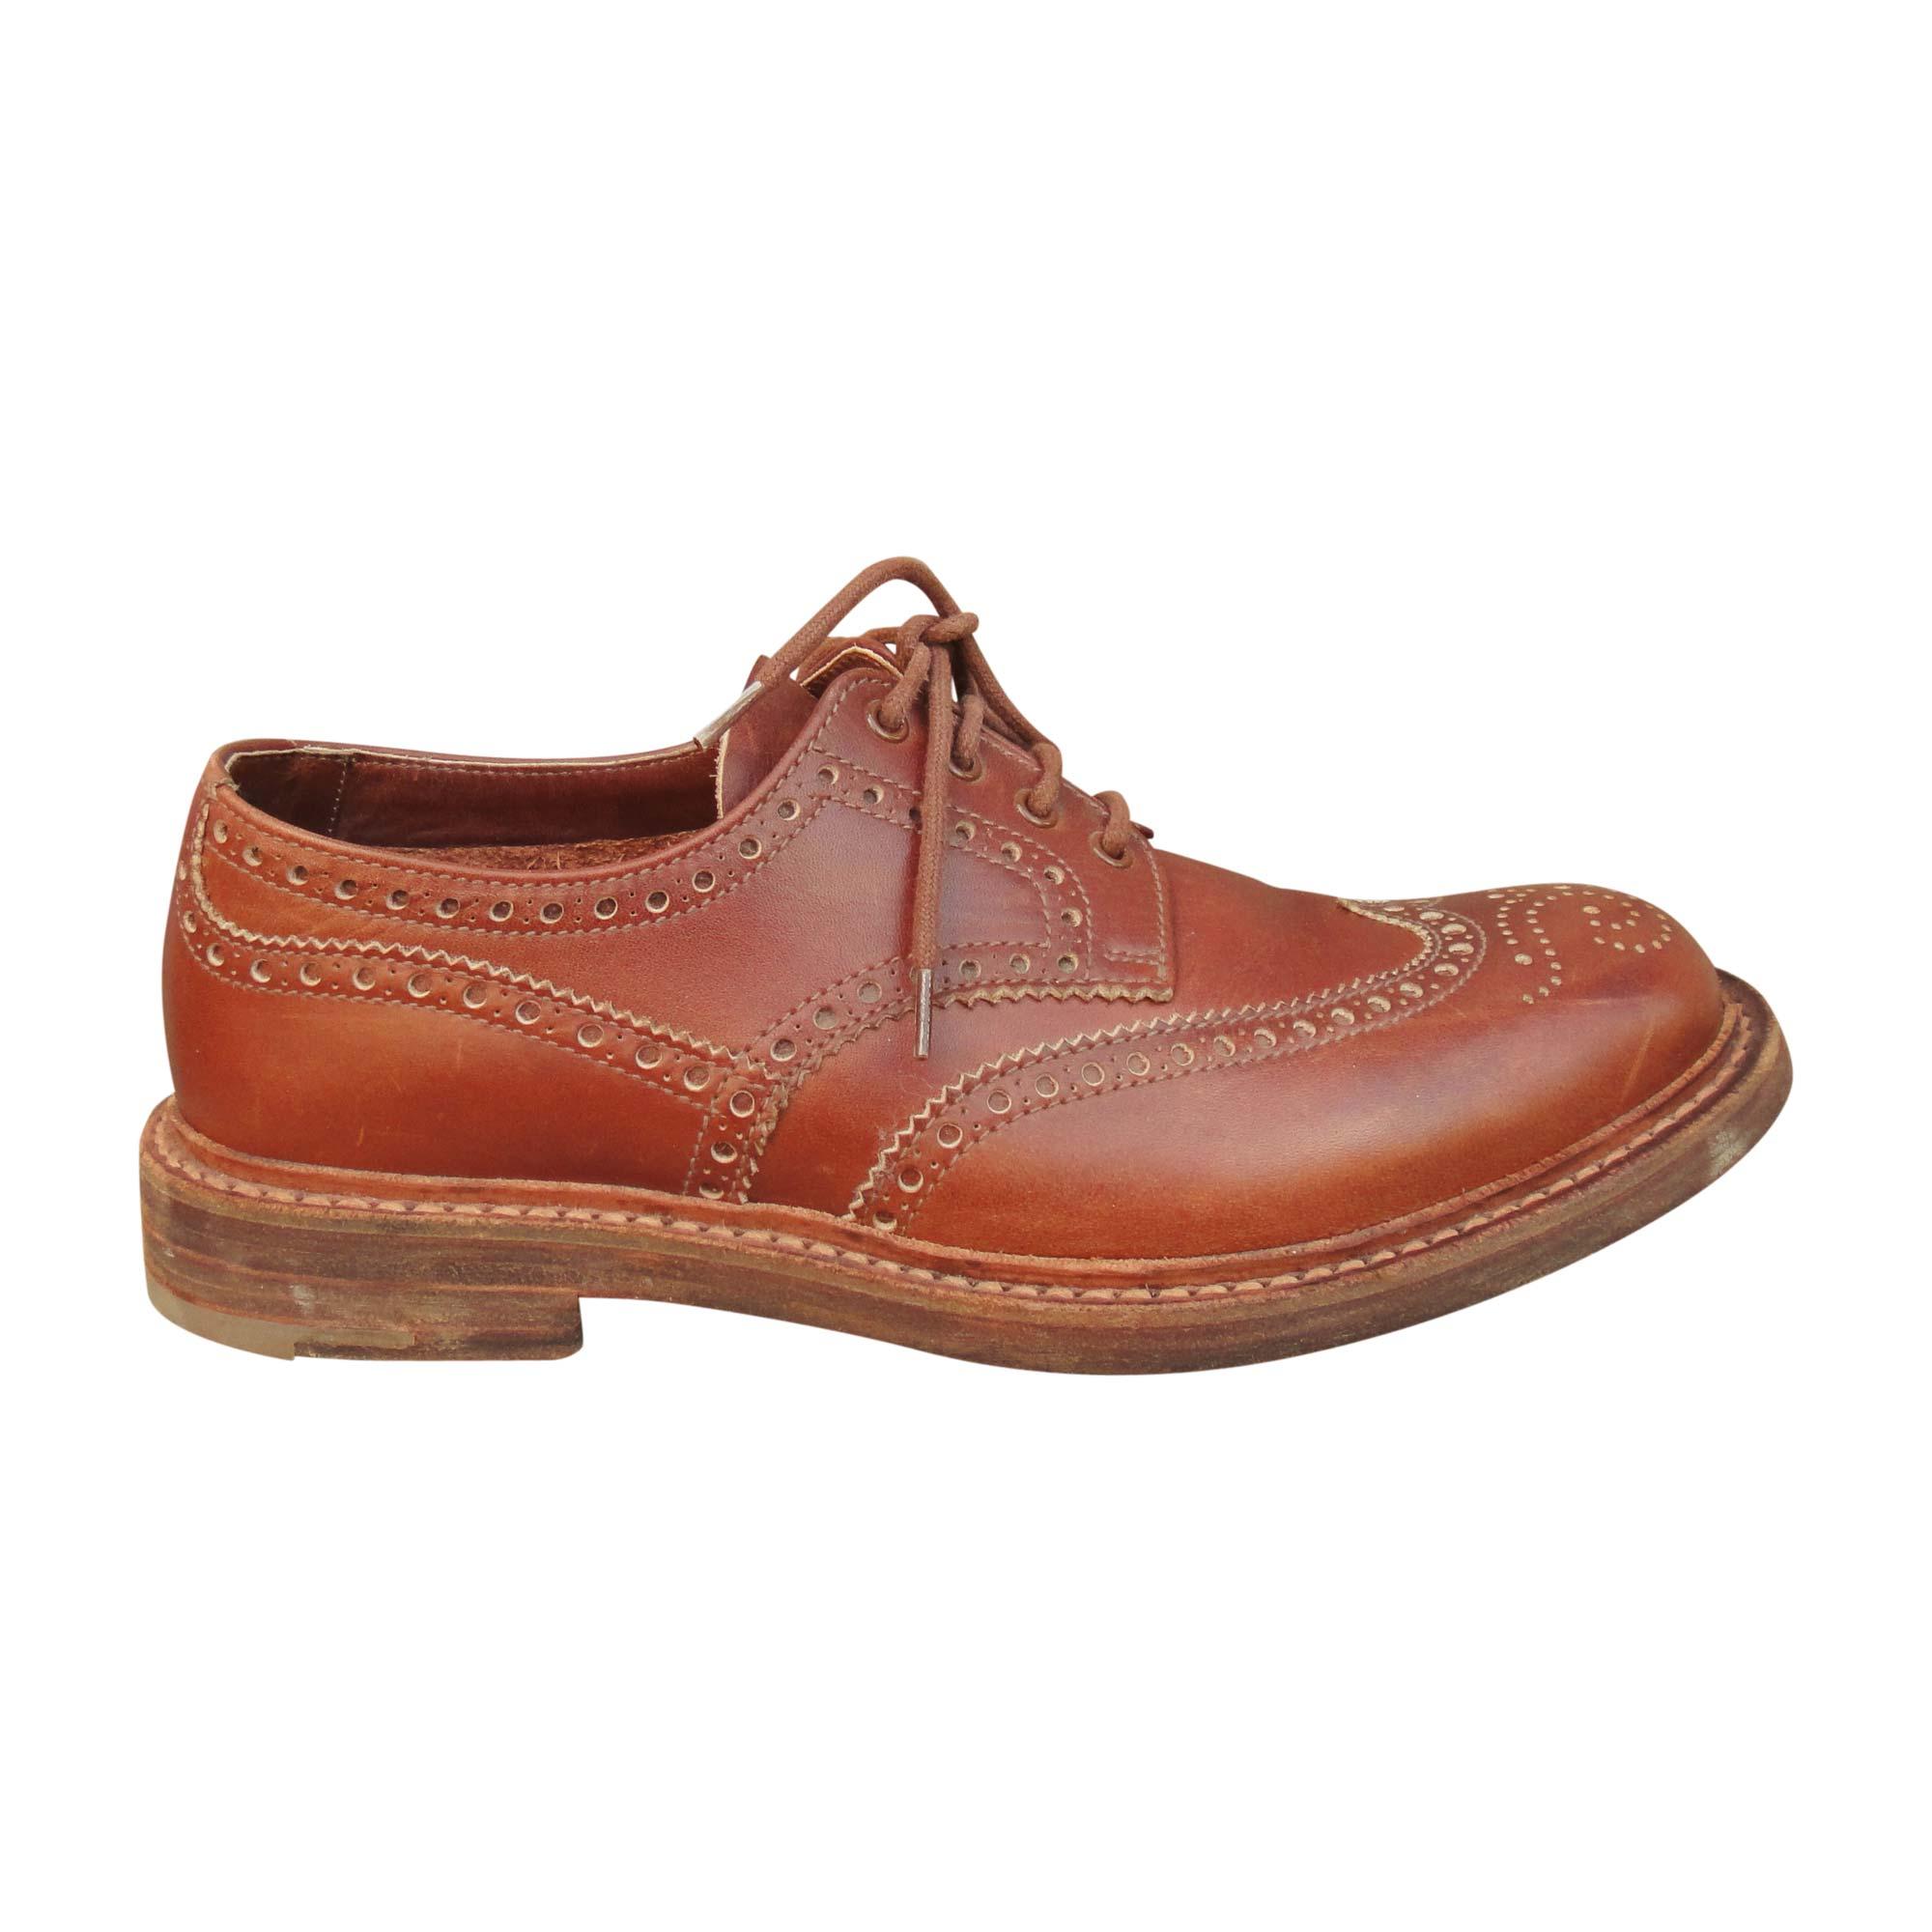 Chaussures à lacets PRADA 42 marron - 7719882 847b56684b56